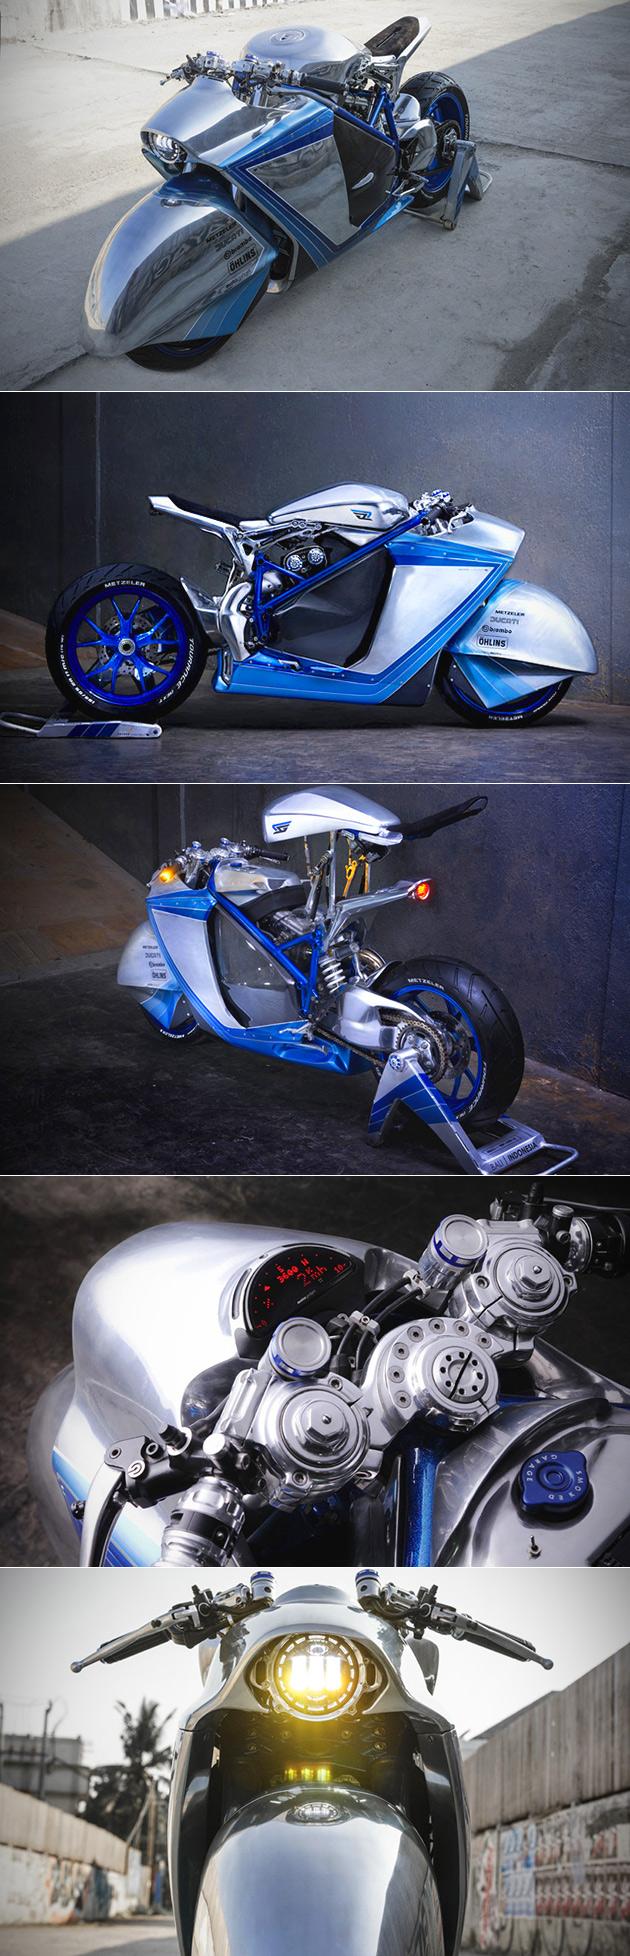 Ducati 848 Neo Racer